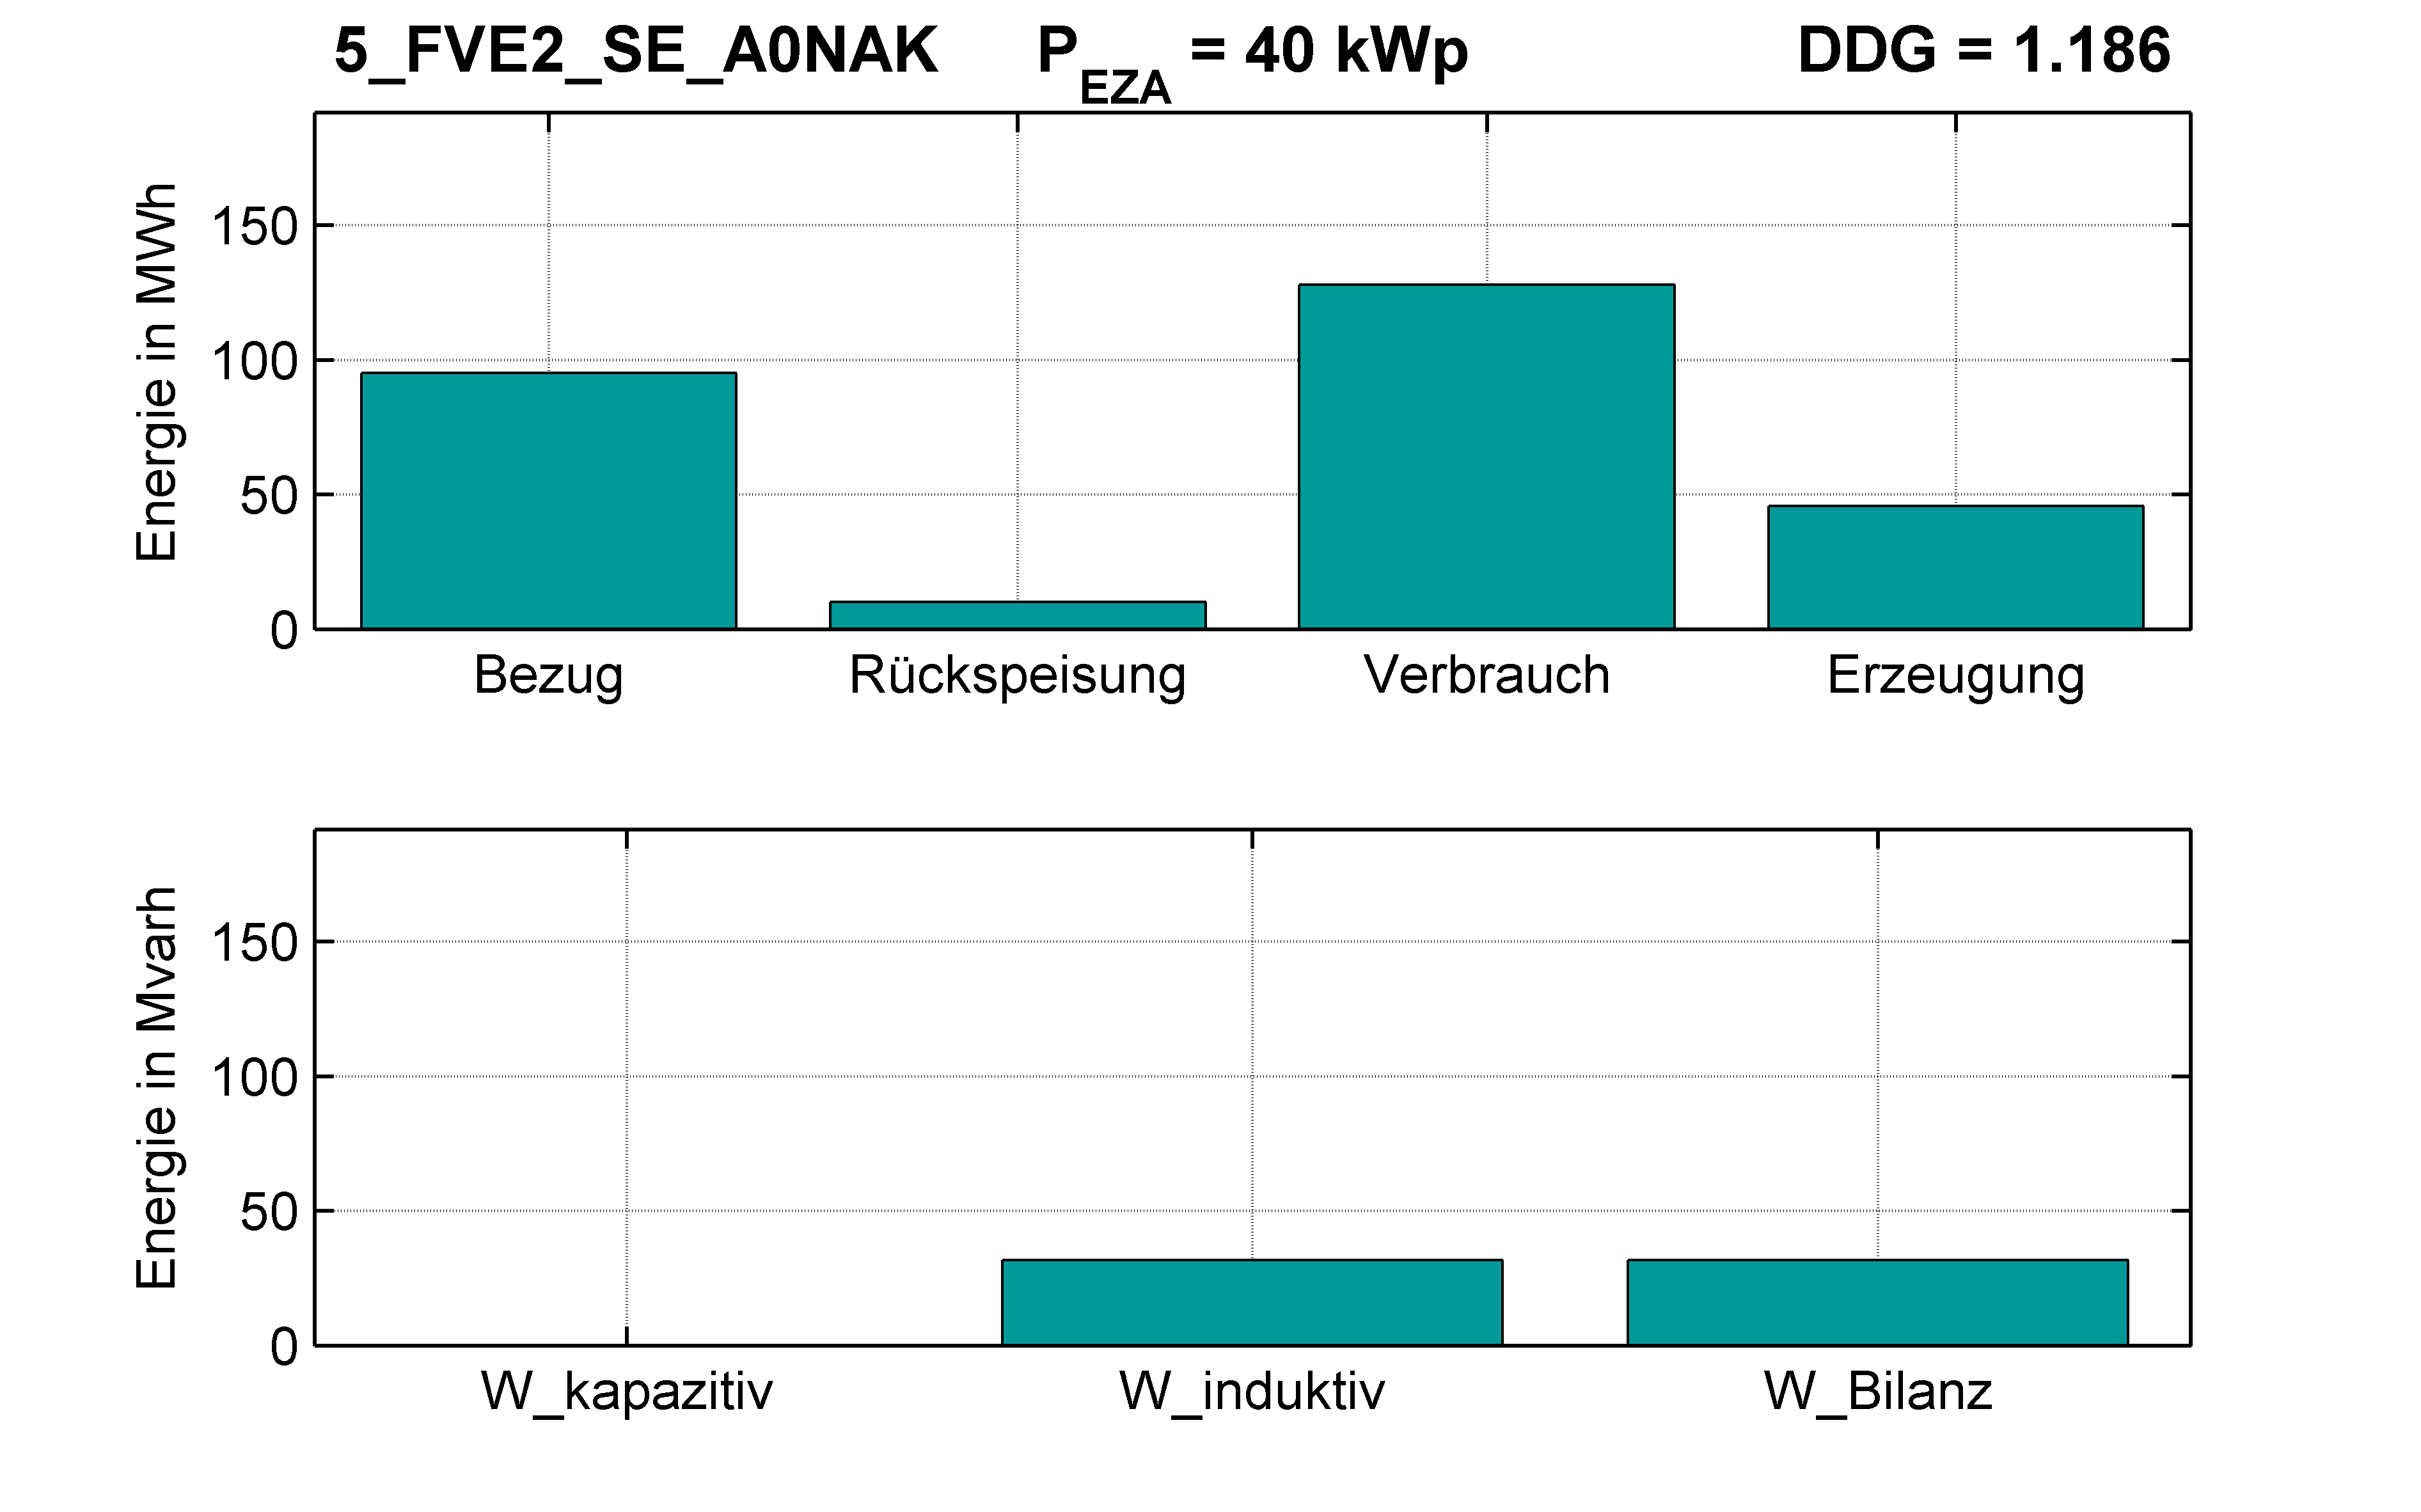 FVE2 | STATION (SE) A0NAK | PQ-Bilanz